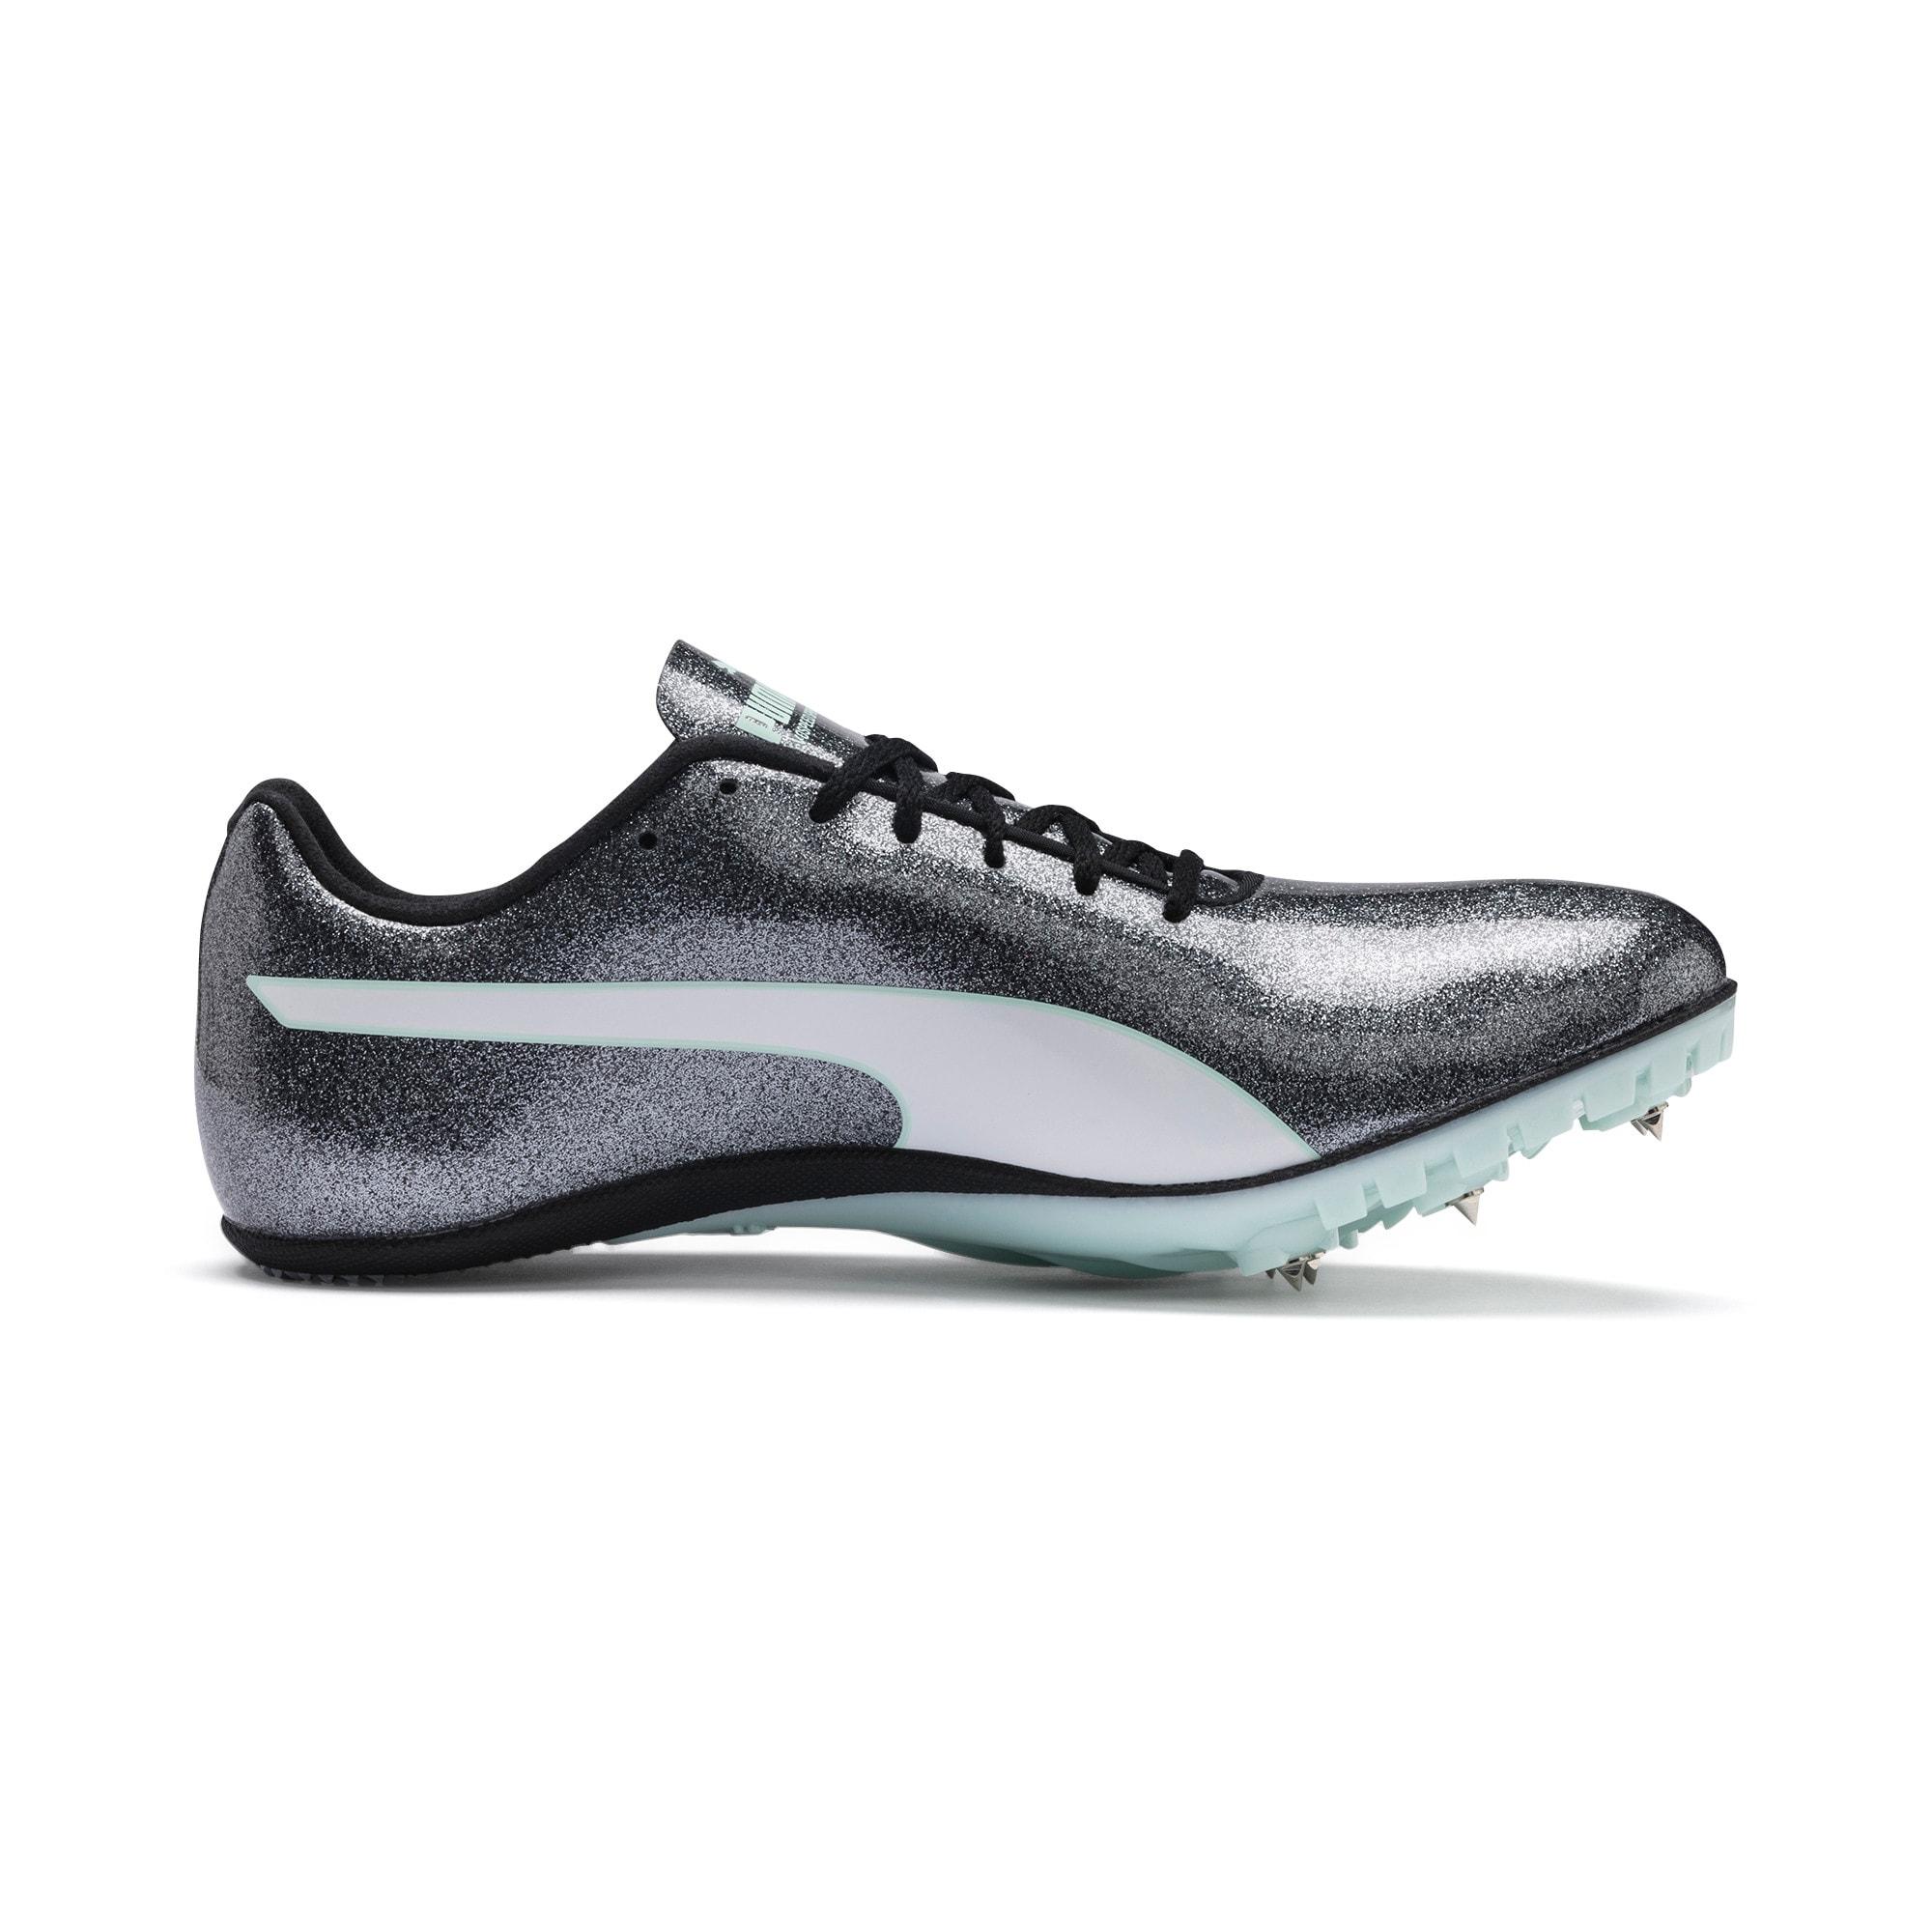 Thumbnail 5 of evoSPEED Sprint 9 Women's Running Shoes, Steel Gray-Fair Aqua-White, medium